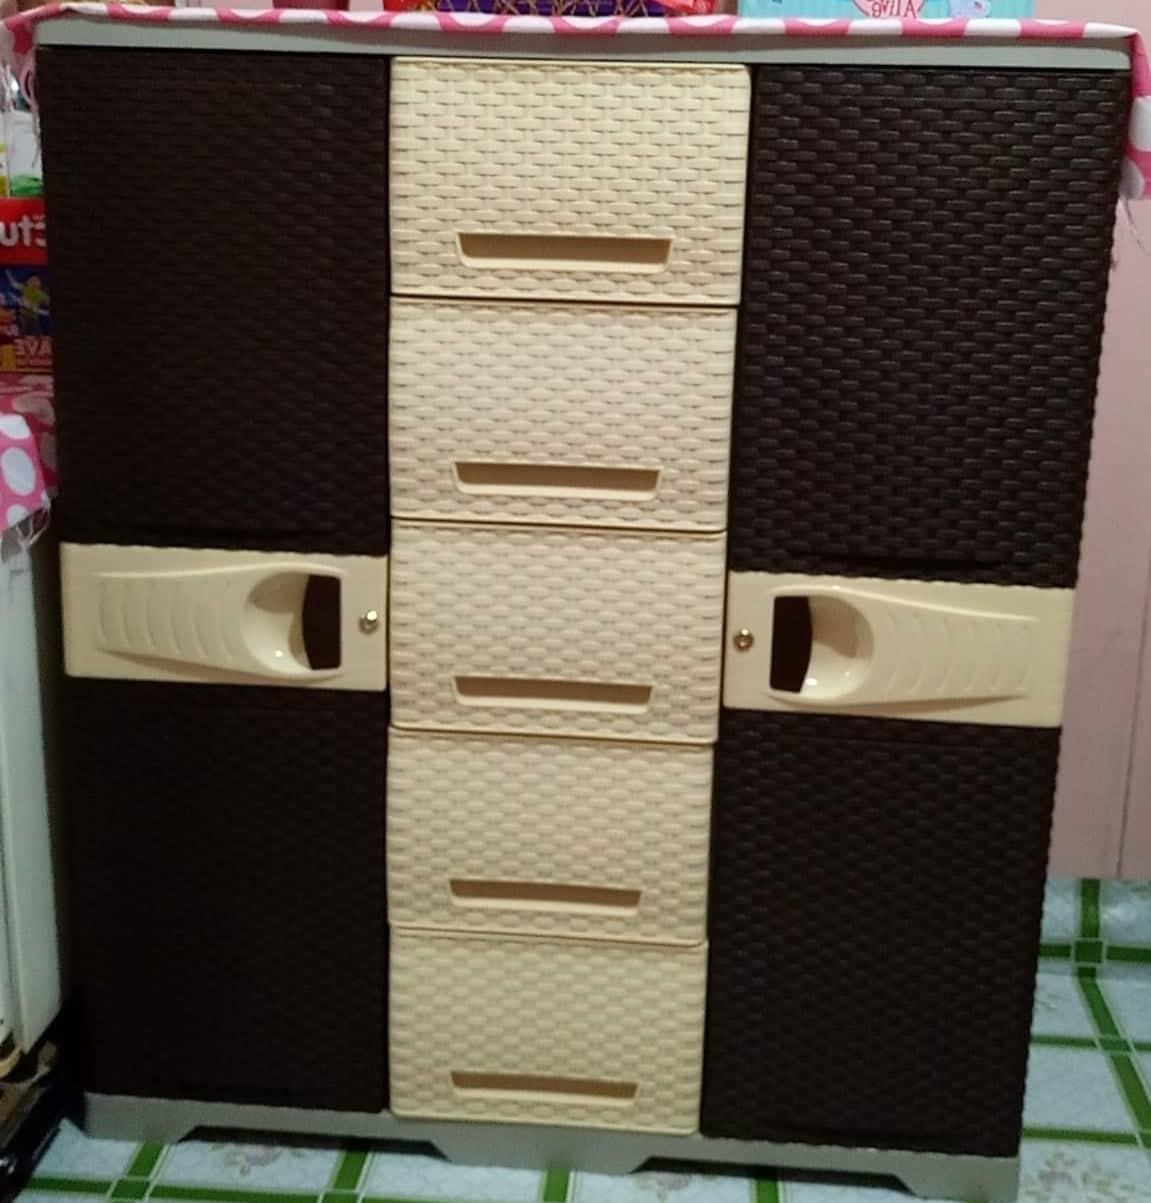 Rattan Plastic Cabinet Lazada Ph, Plastic Drawer Cabinet Philippines